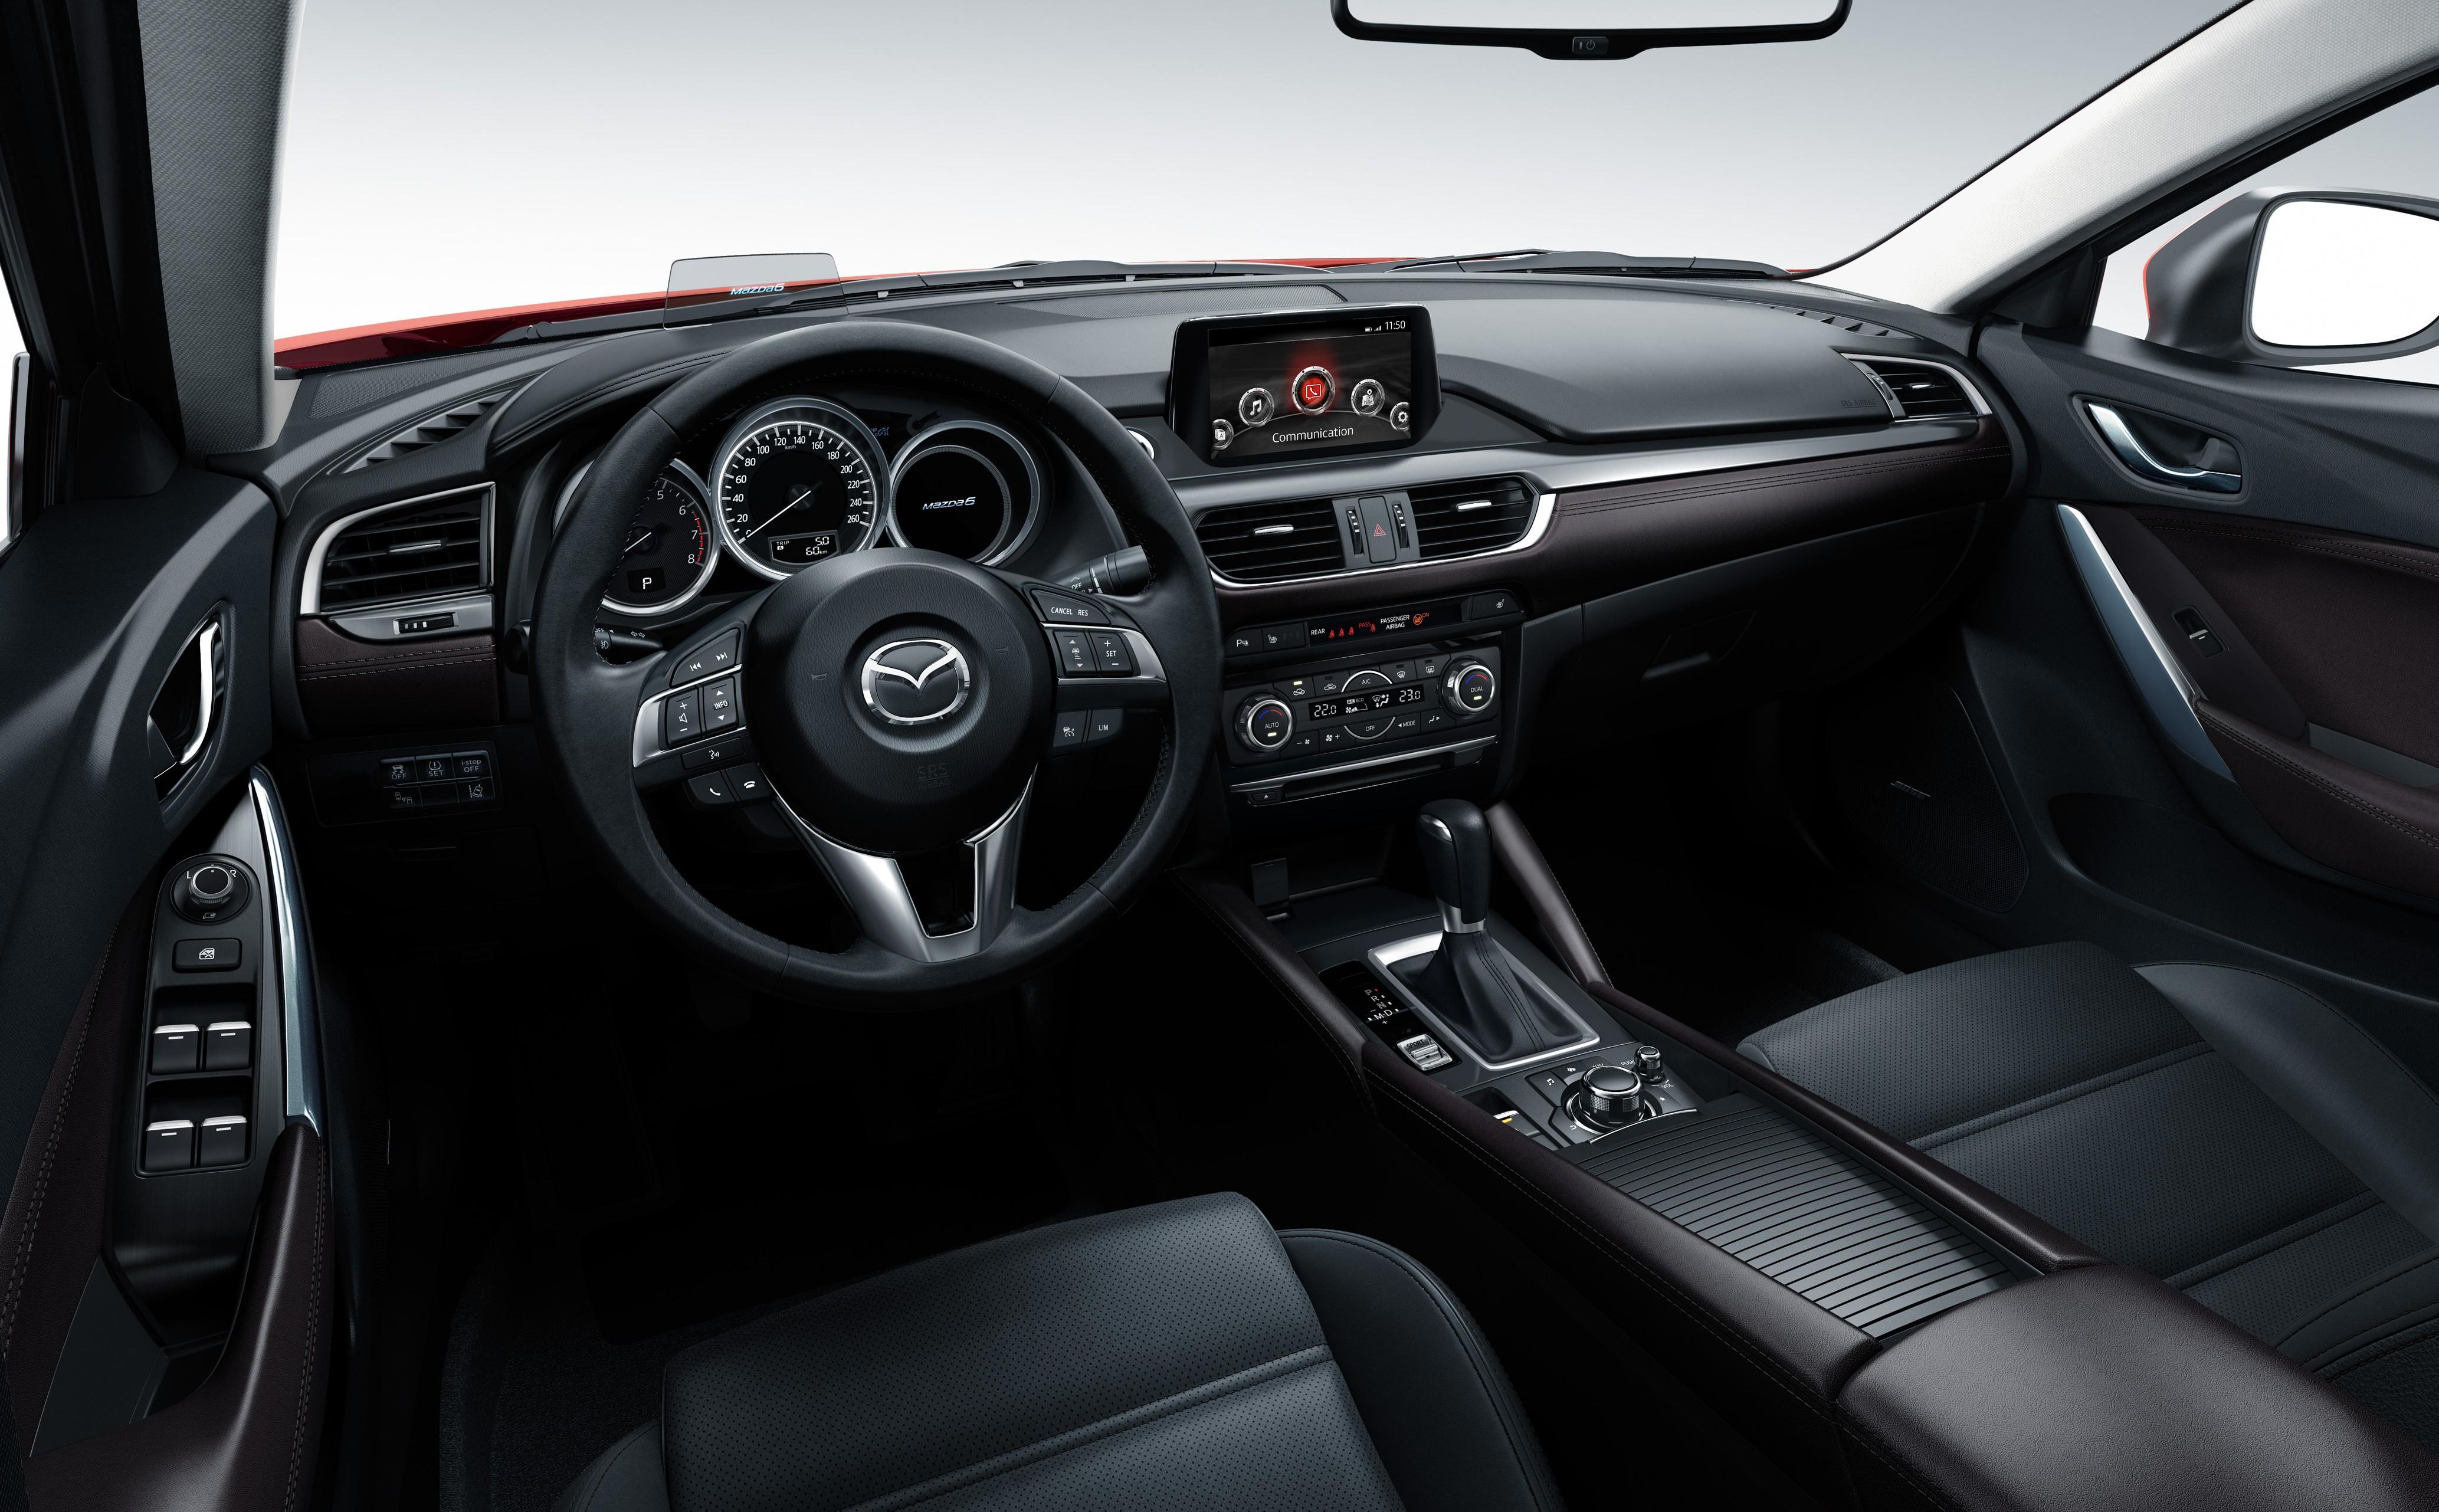 mazda 6 2016 facelift. mazda 6 facelift unveiled at the 2014 la motor show image 289568 2016 o